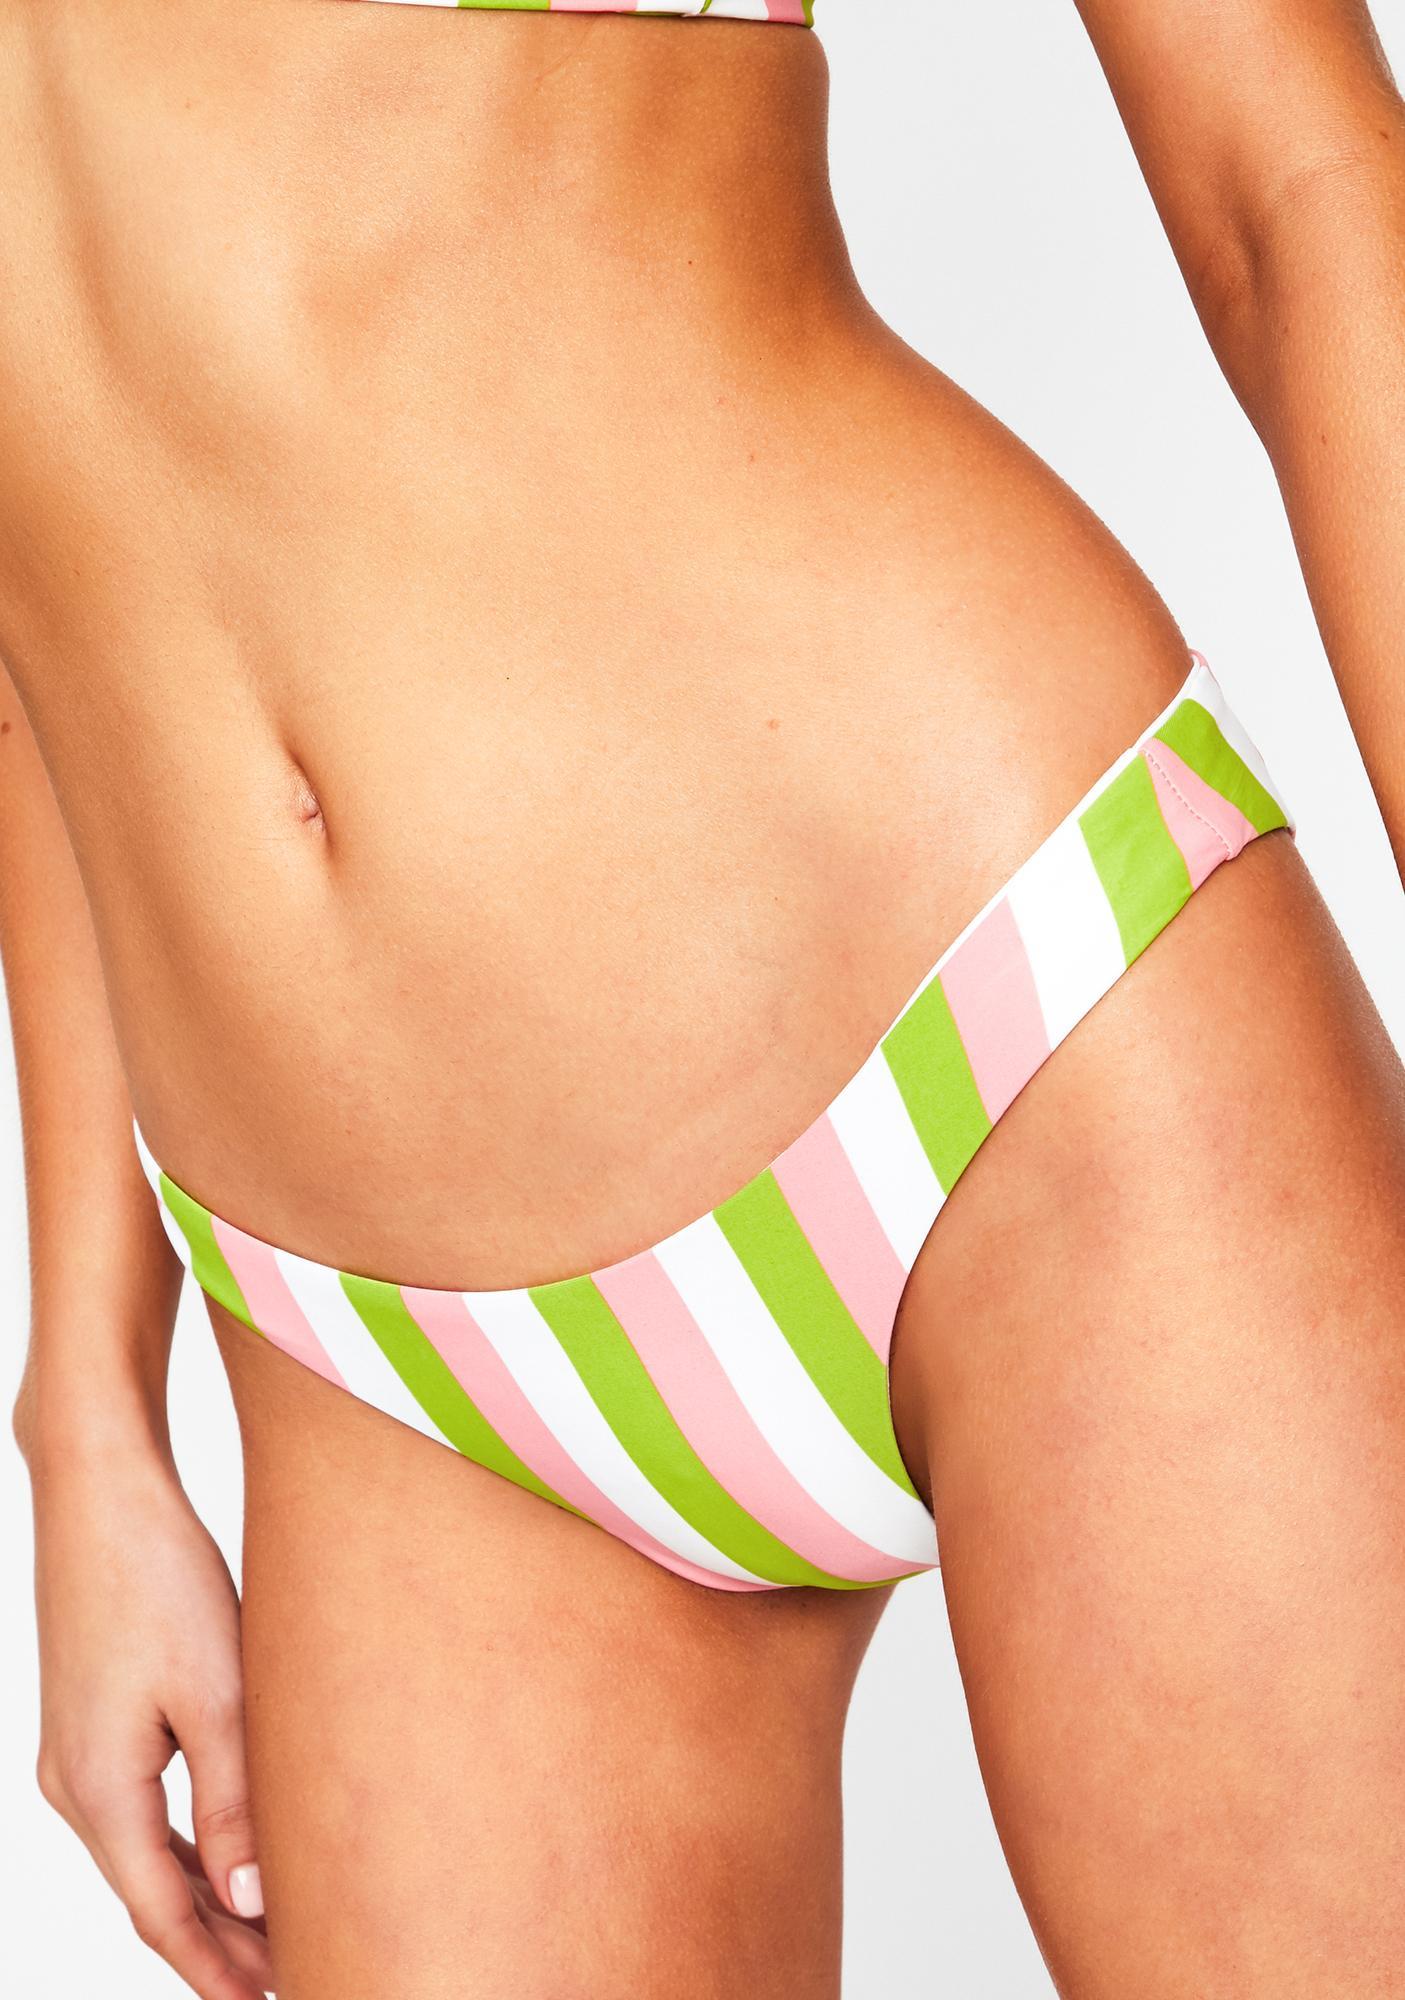 Dippin' Daisy's Guava Stripe Nocturnal Bikini Bottoms